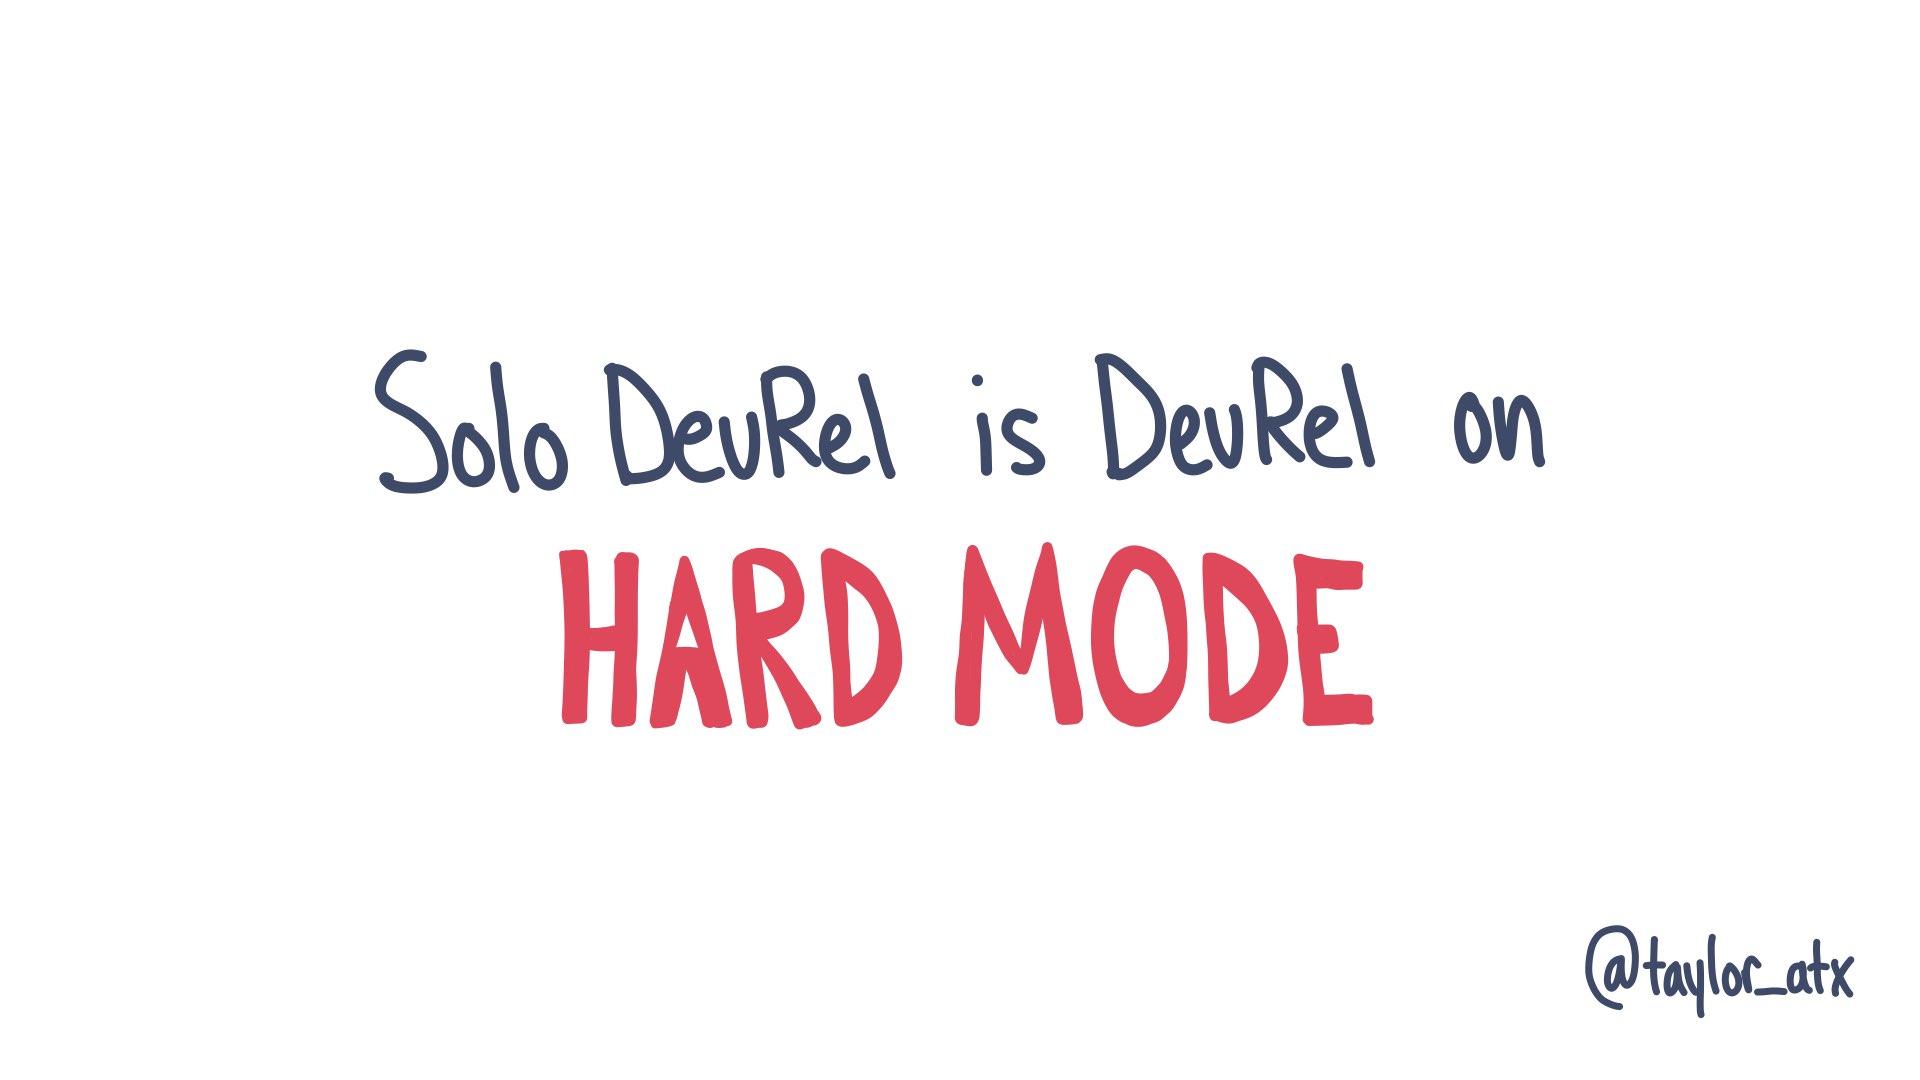 Solo DevRel is DevRel on HARD MODE